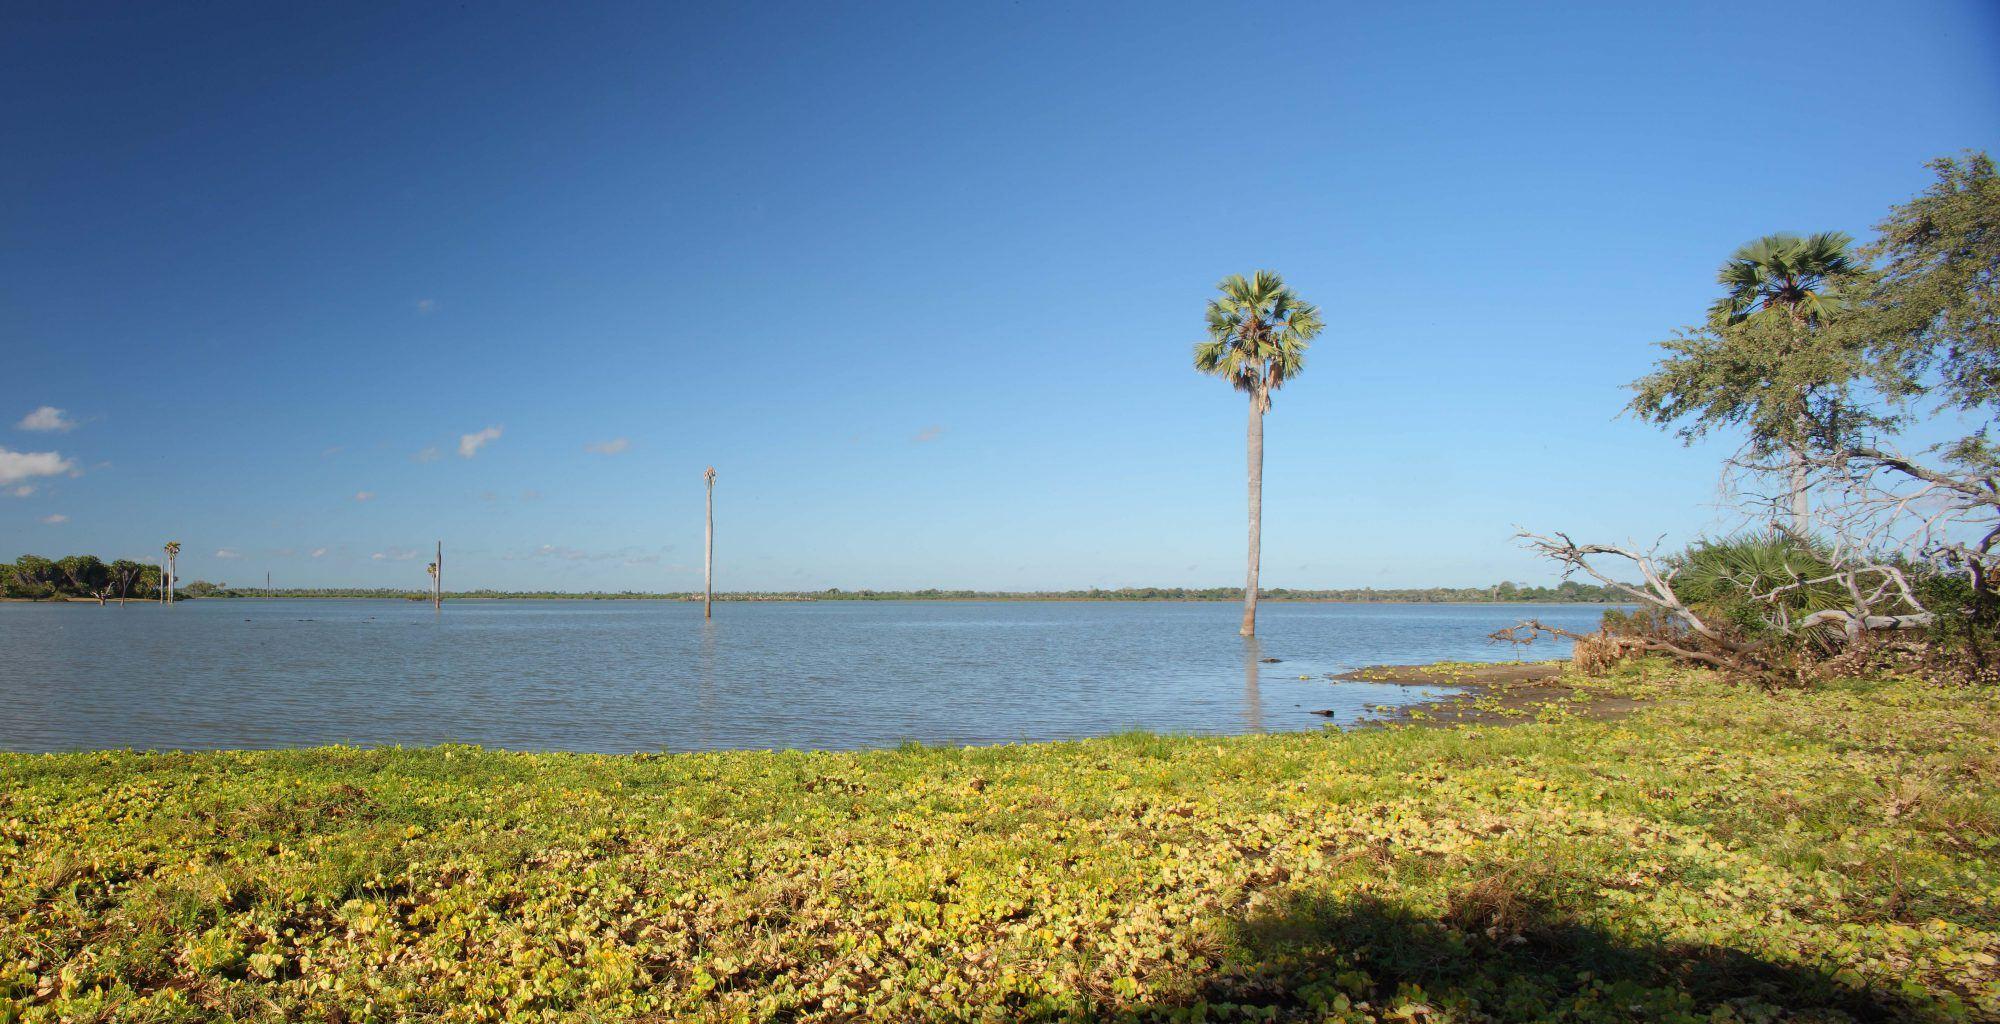 Tanzania-Selous-Game-Reserve-Landscape